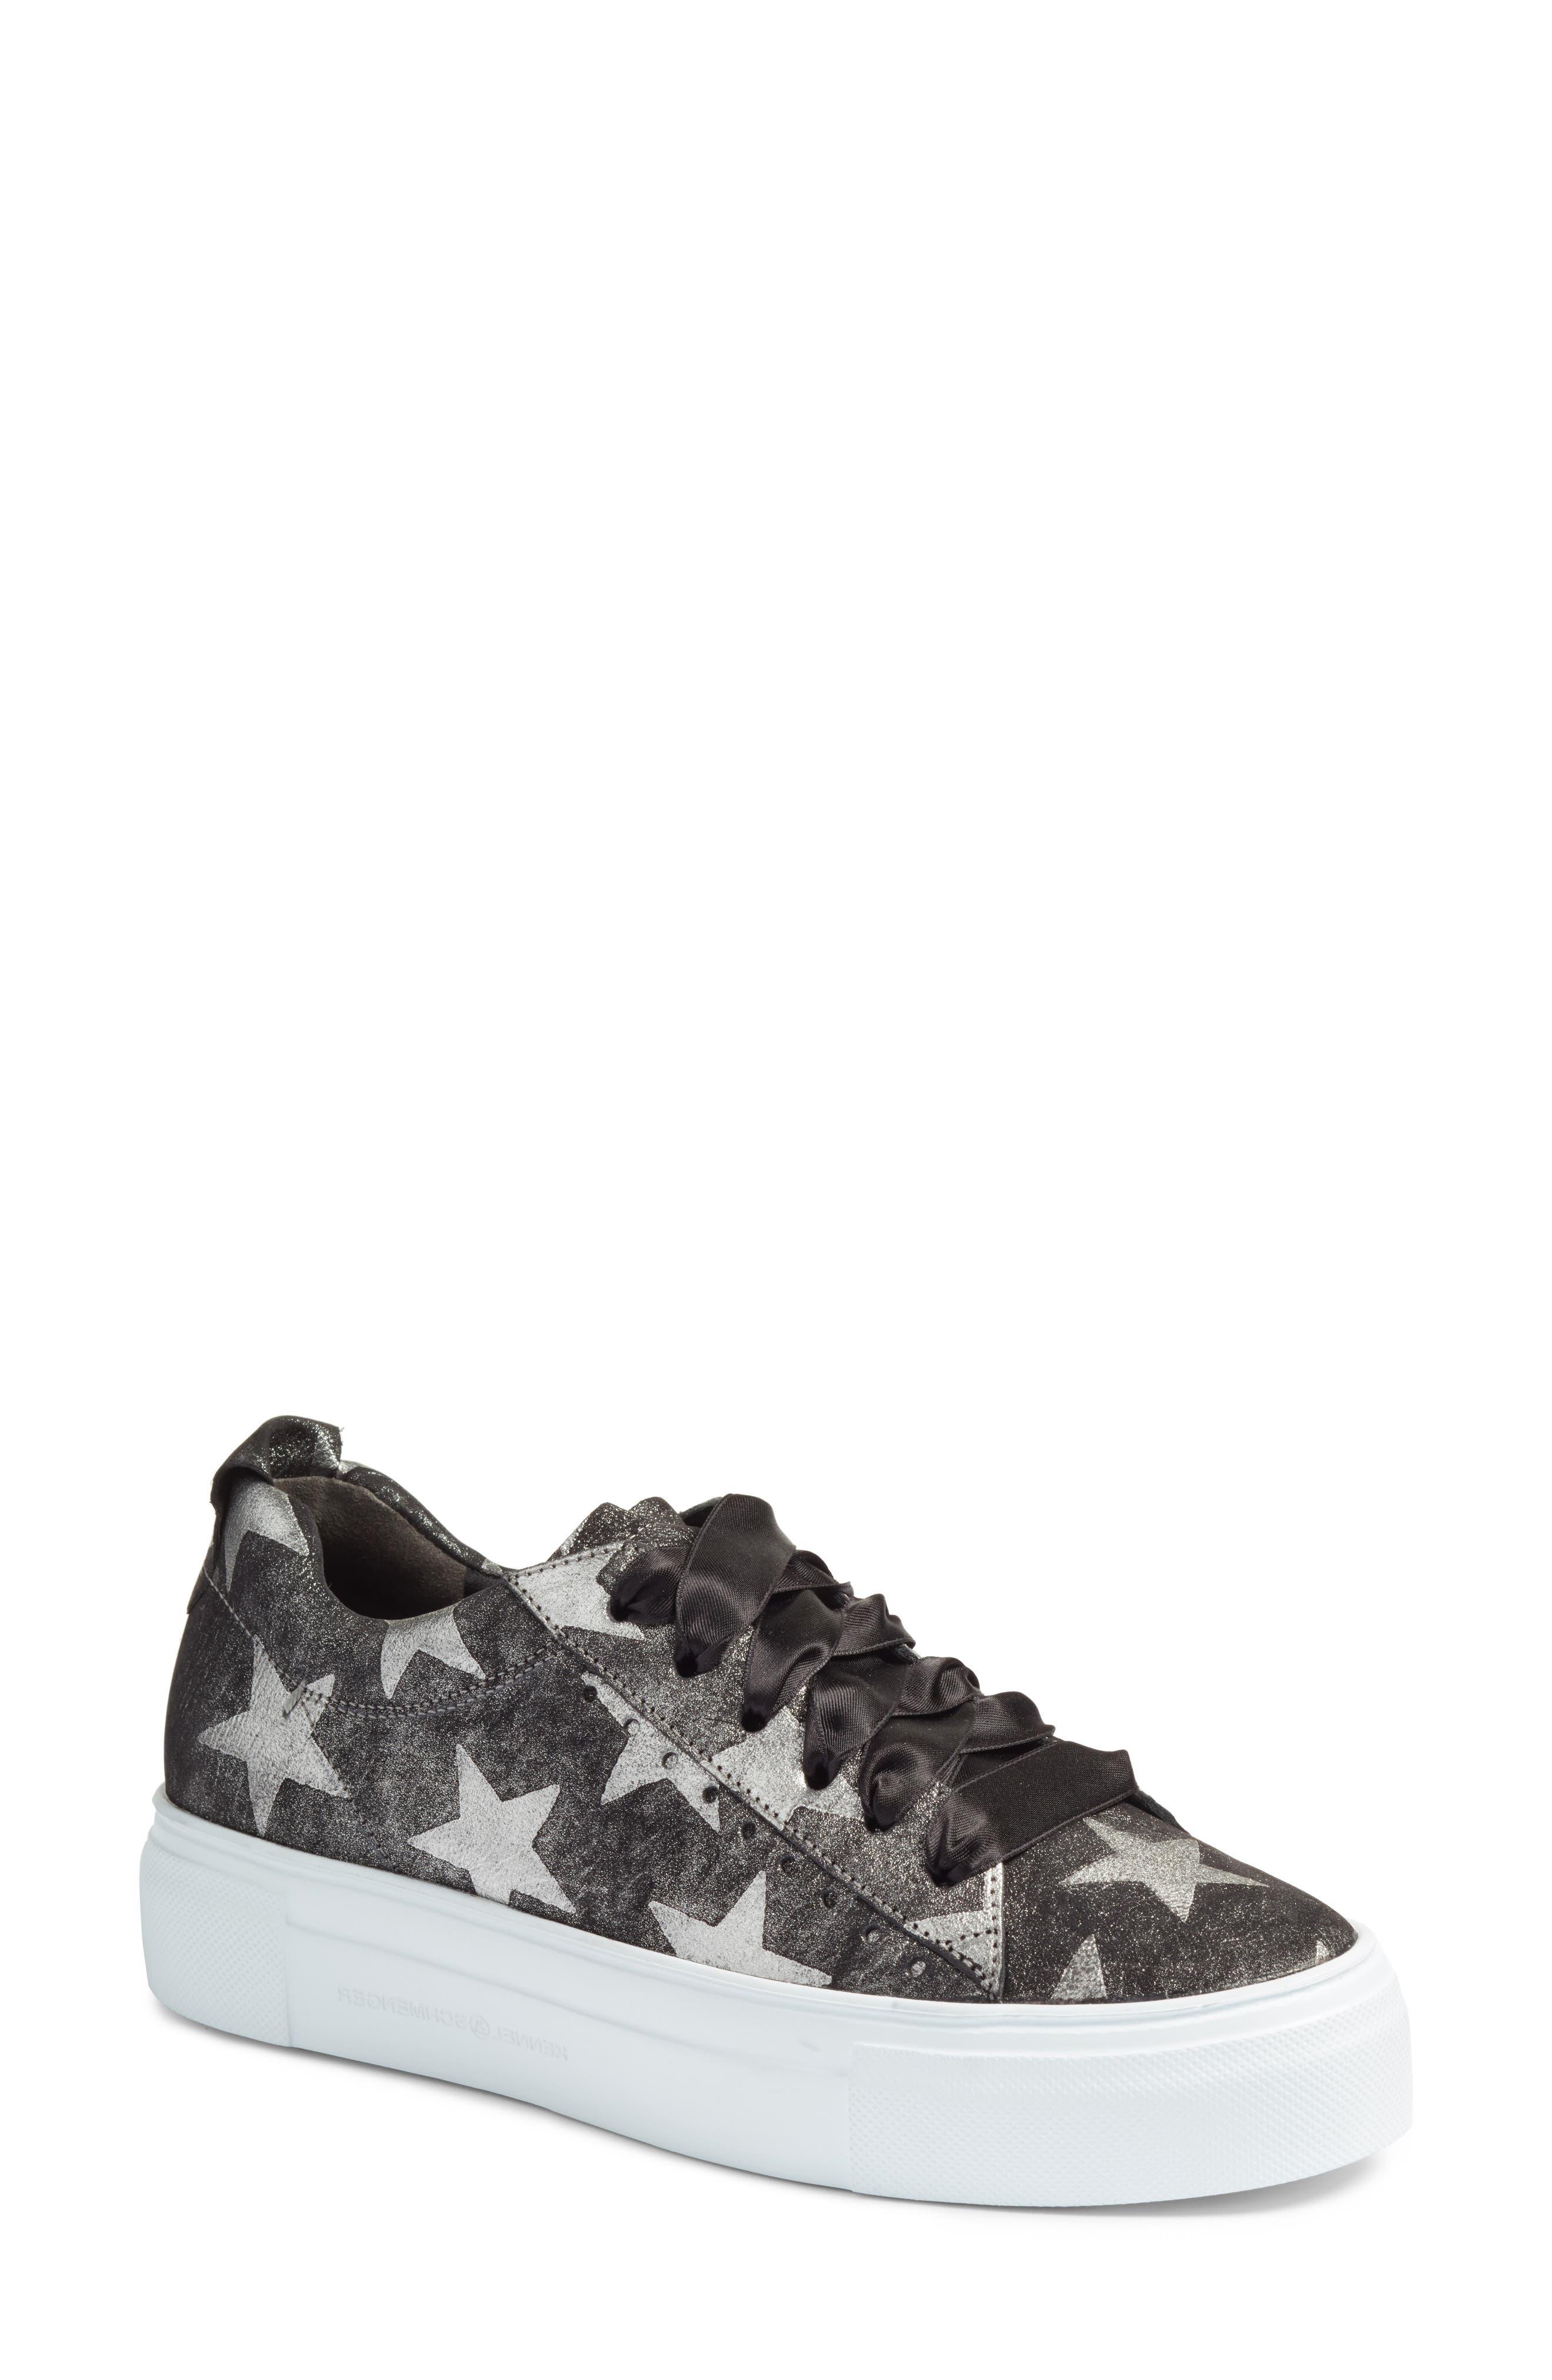 Kennel & Schmenger Big Star Sneaker,                         Main,                         color, 001